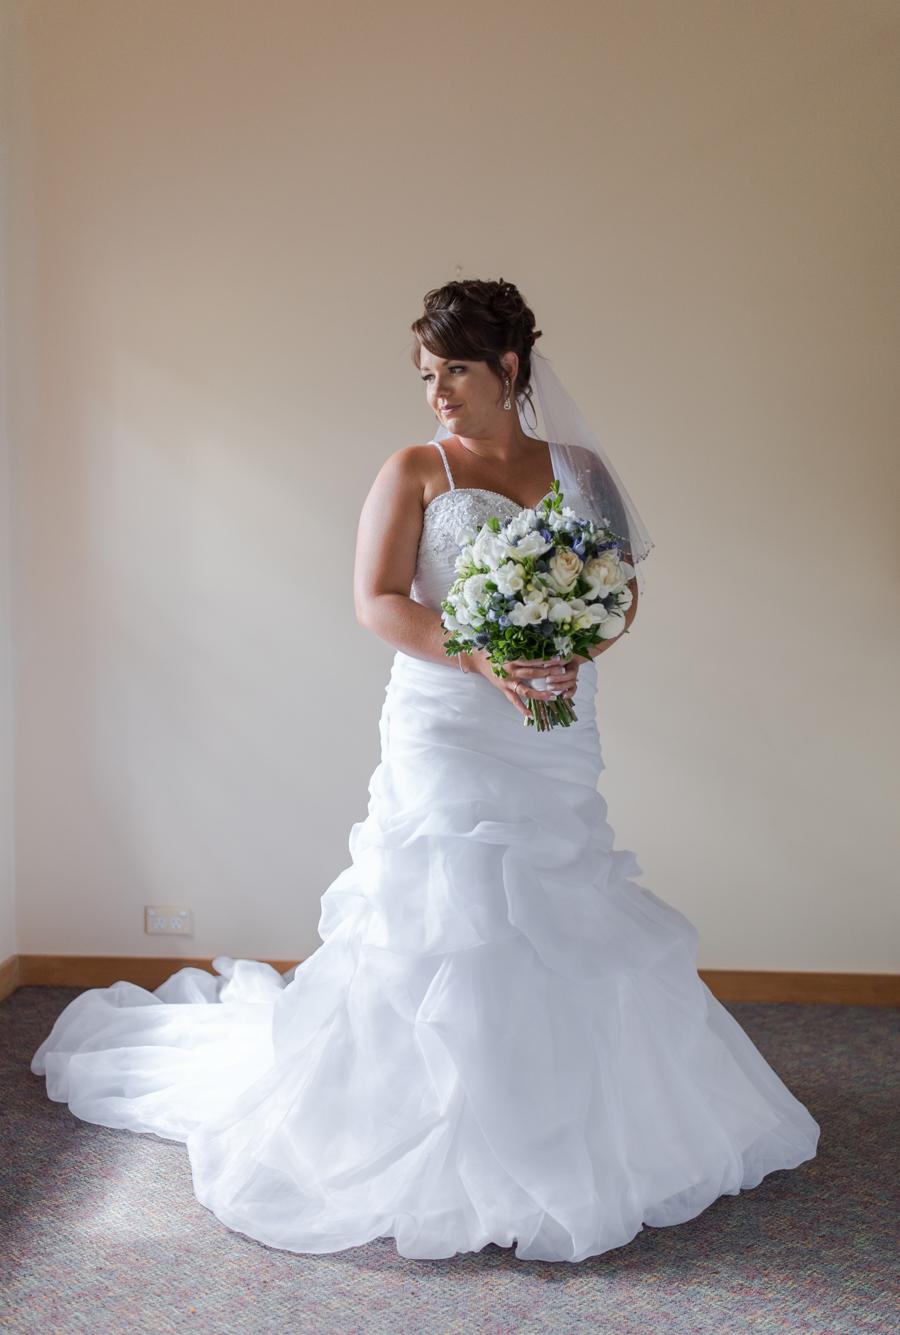 fraser island wedding photographer (19 of 65).jpg